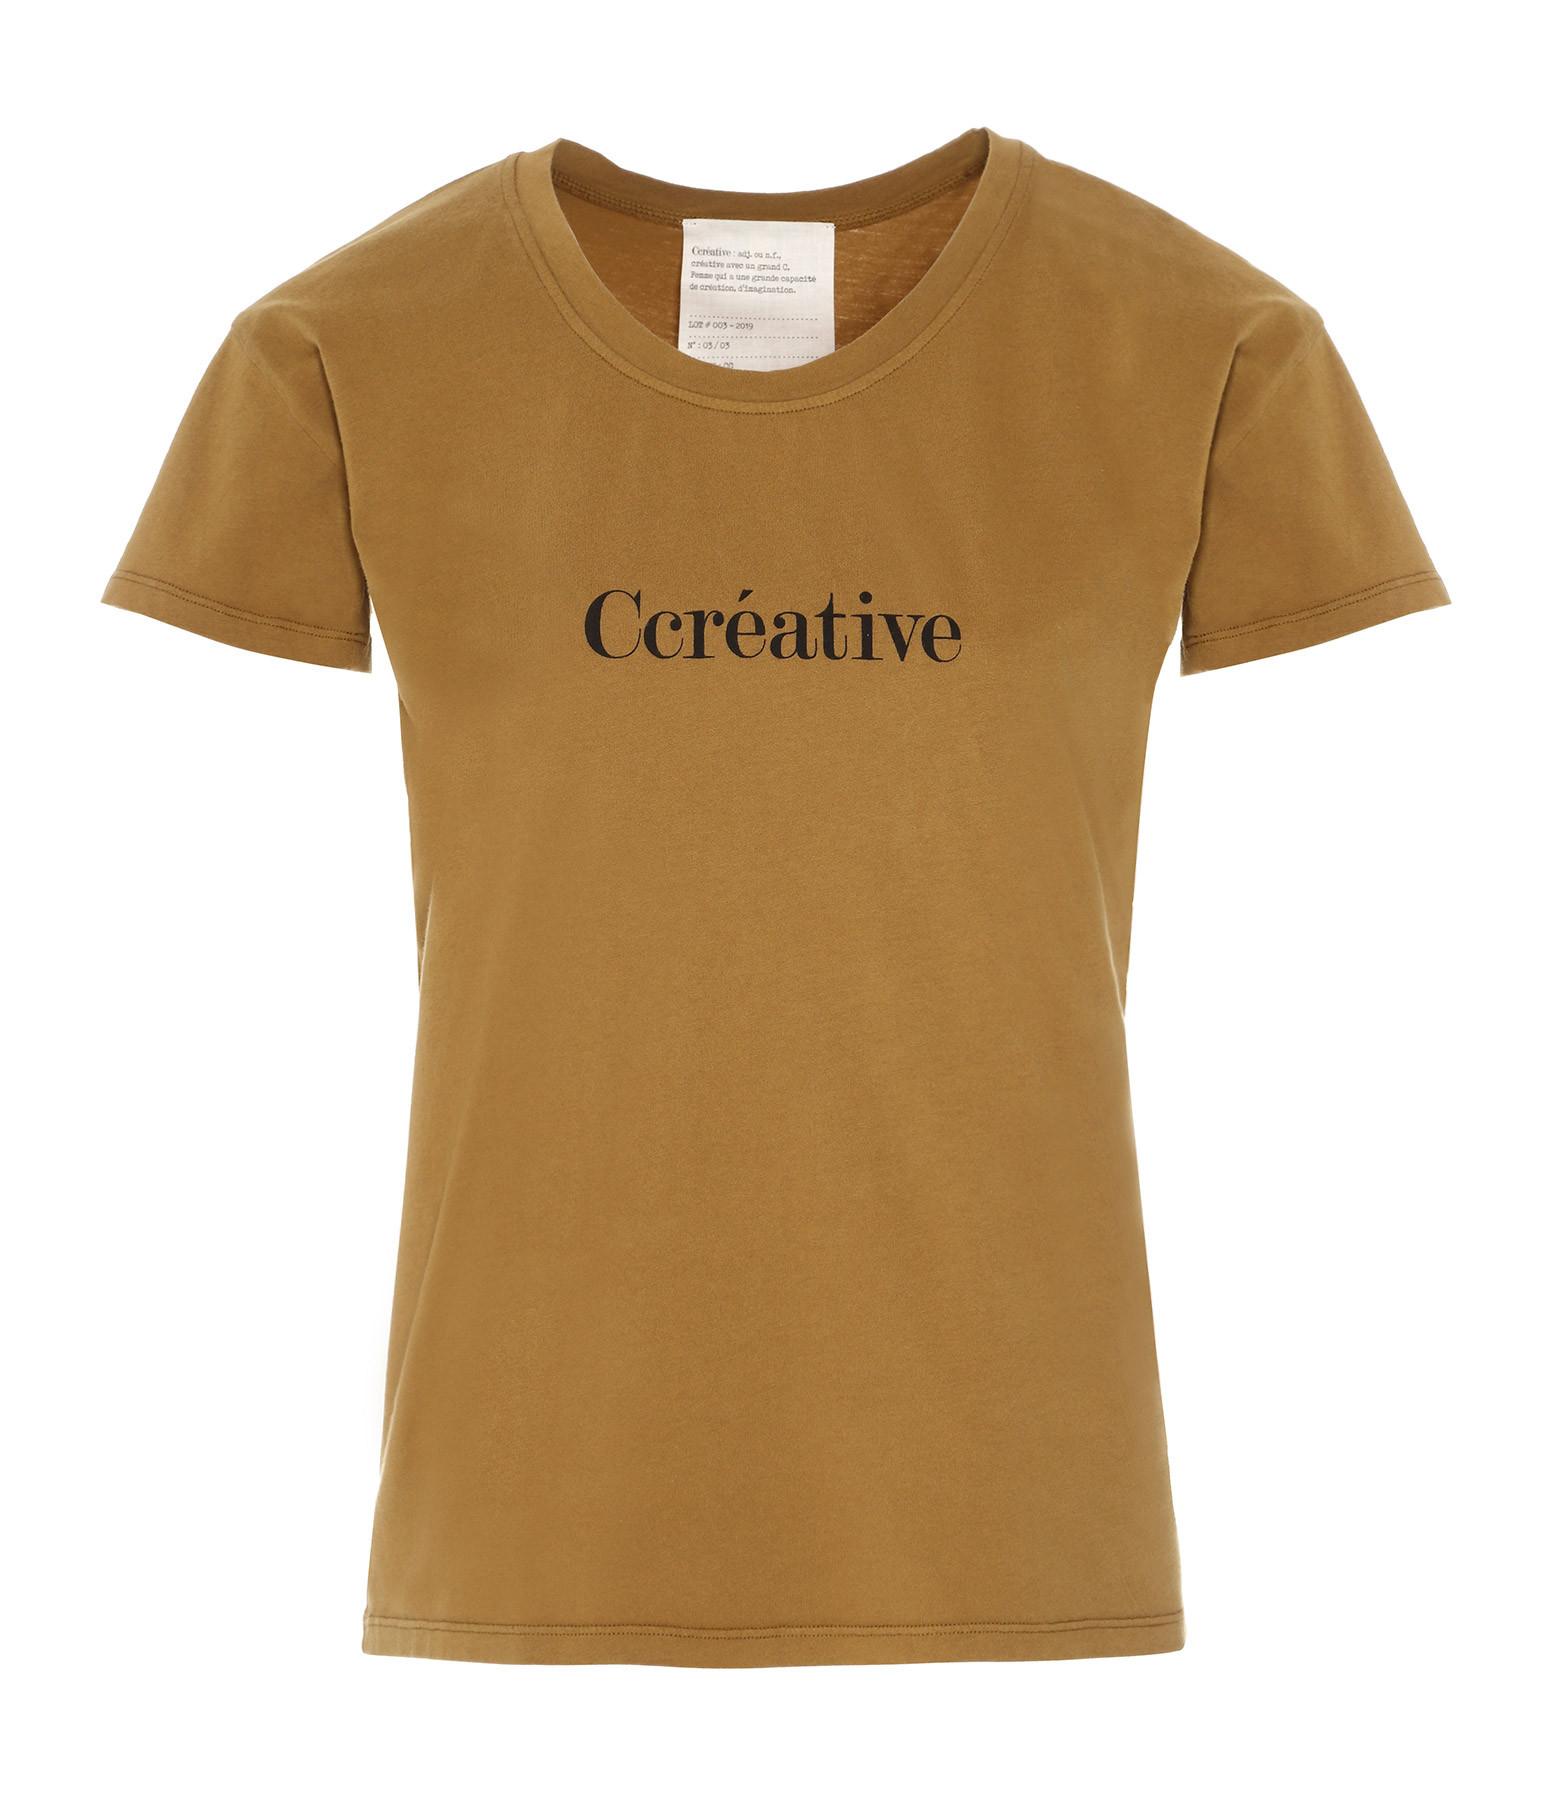 VANESSA BRUNO - Tee-shirt Ccréative Coton Kaki